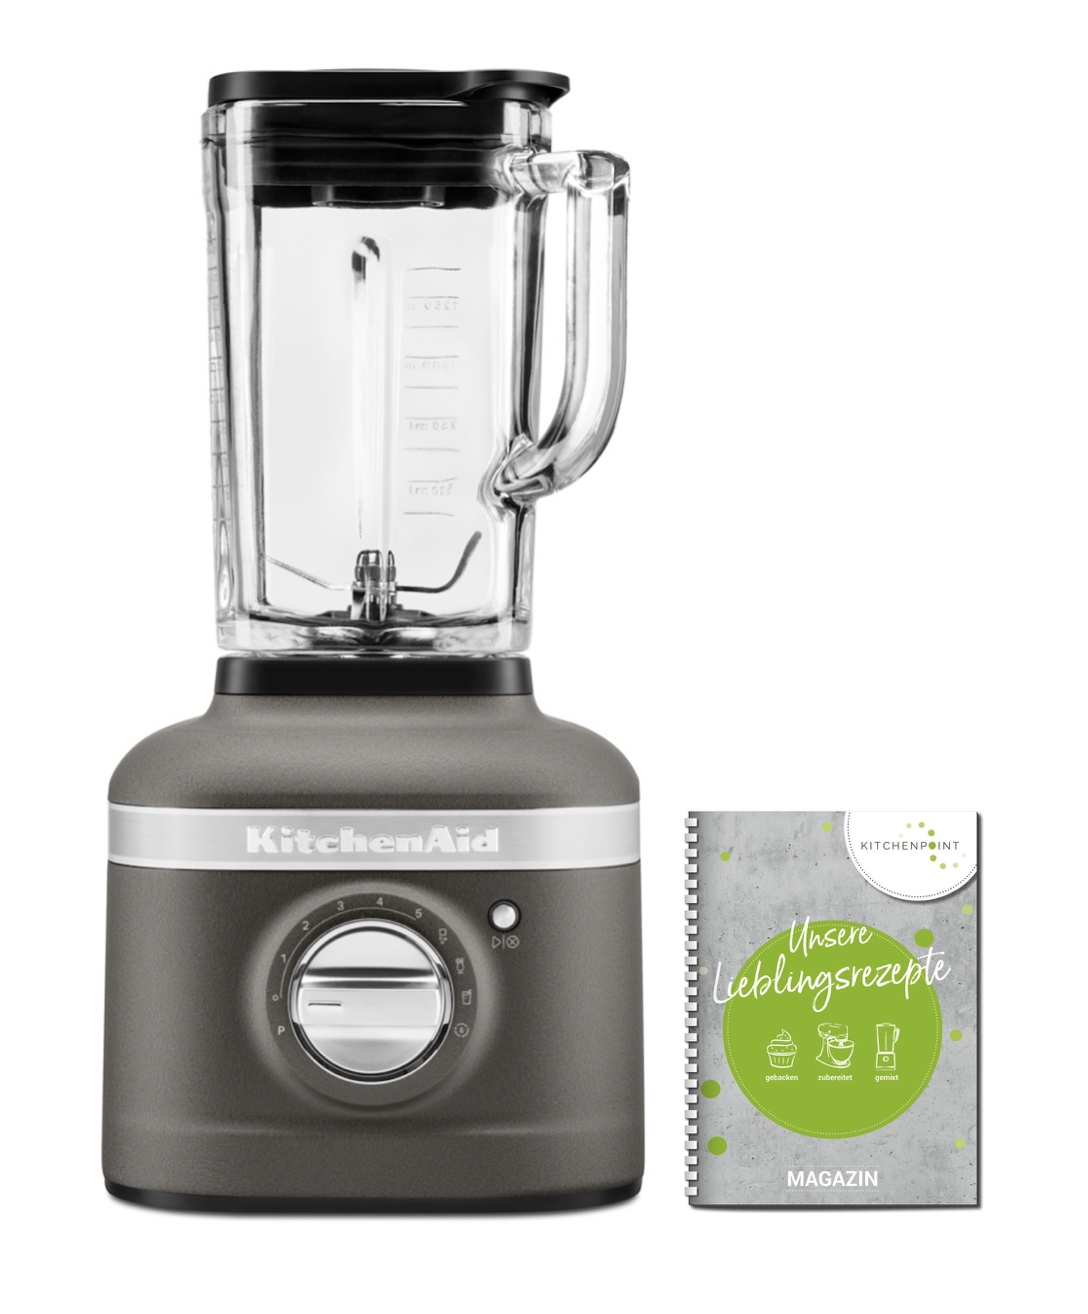 KitchenAid Artisan Blender K400 Mixer Grau